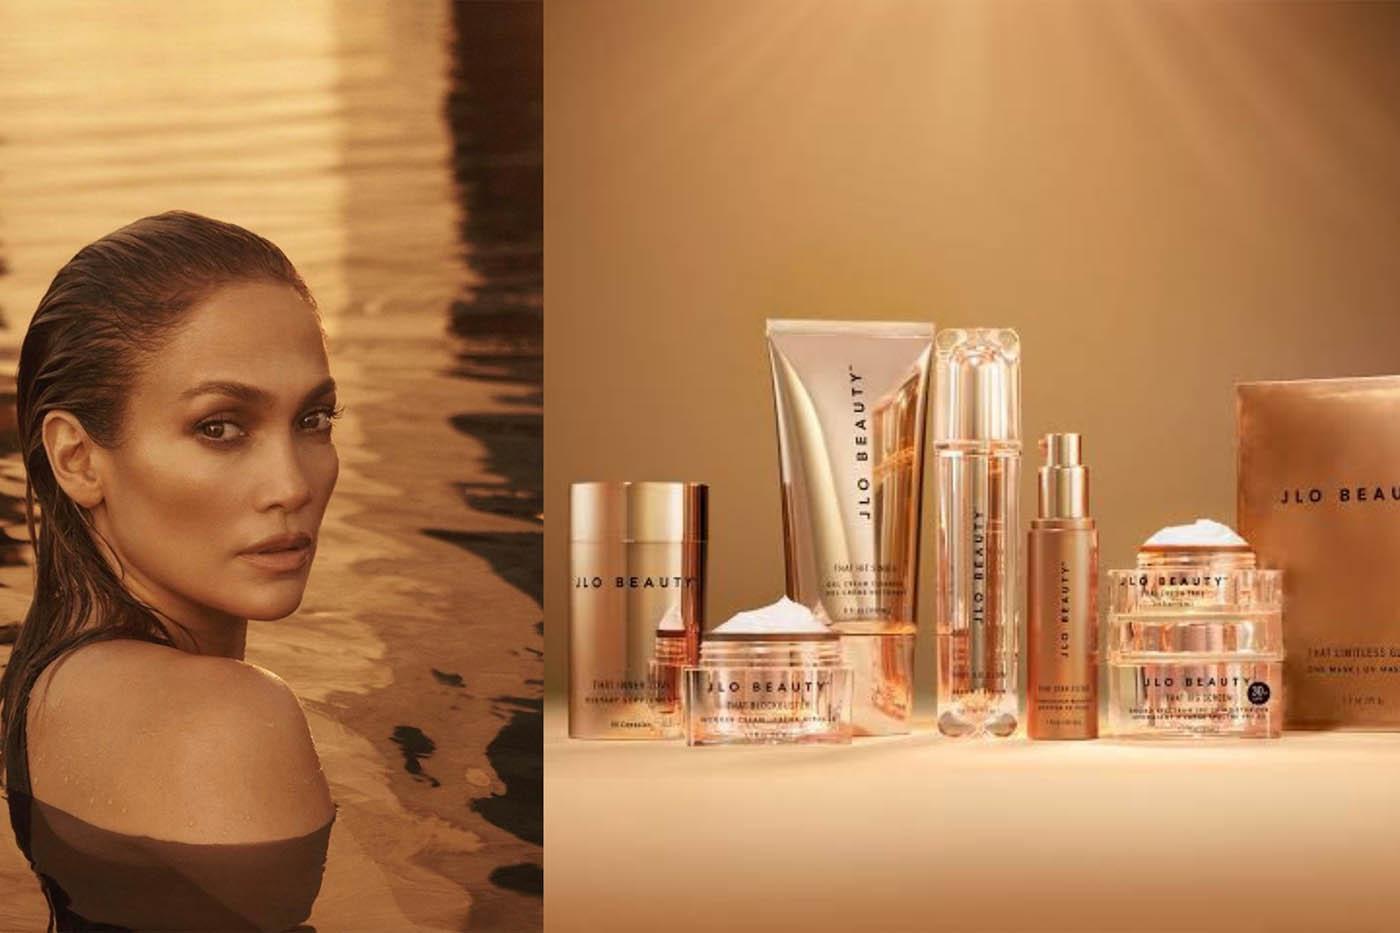 Jennifer Lopez launches J Lo Beauty, a new skincare line